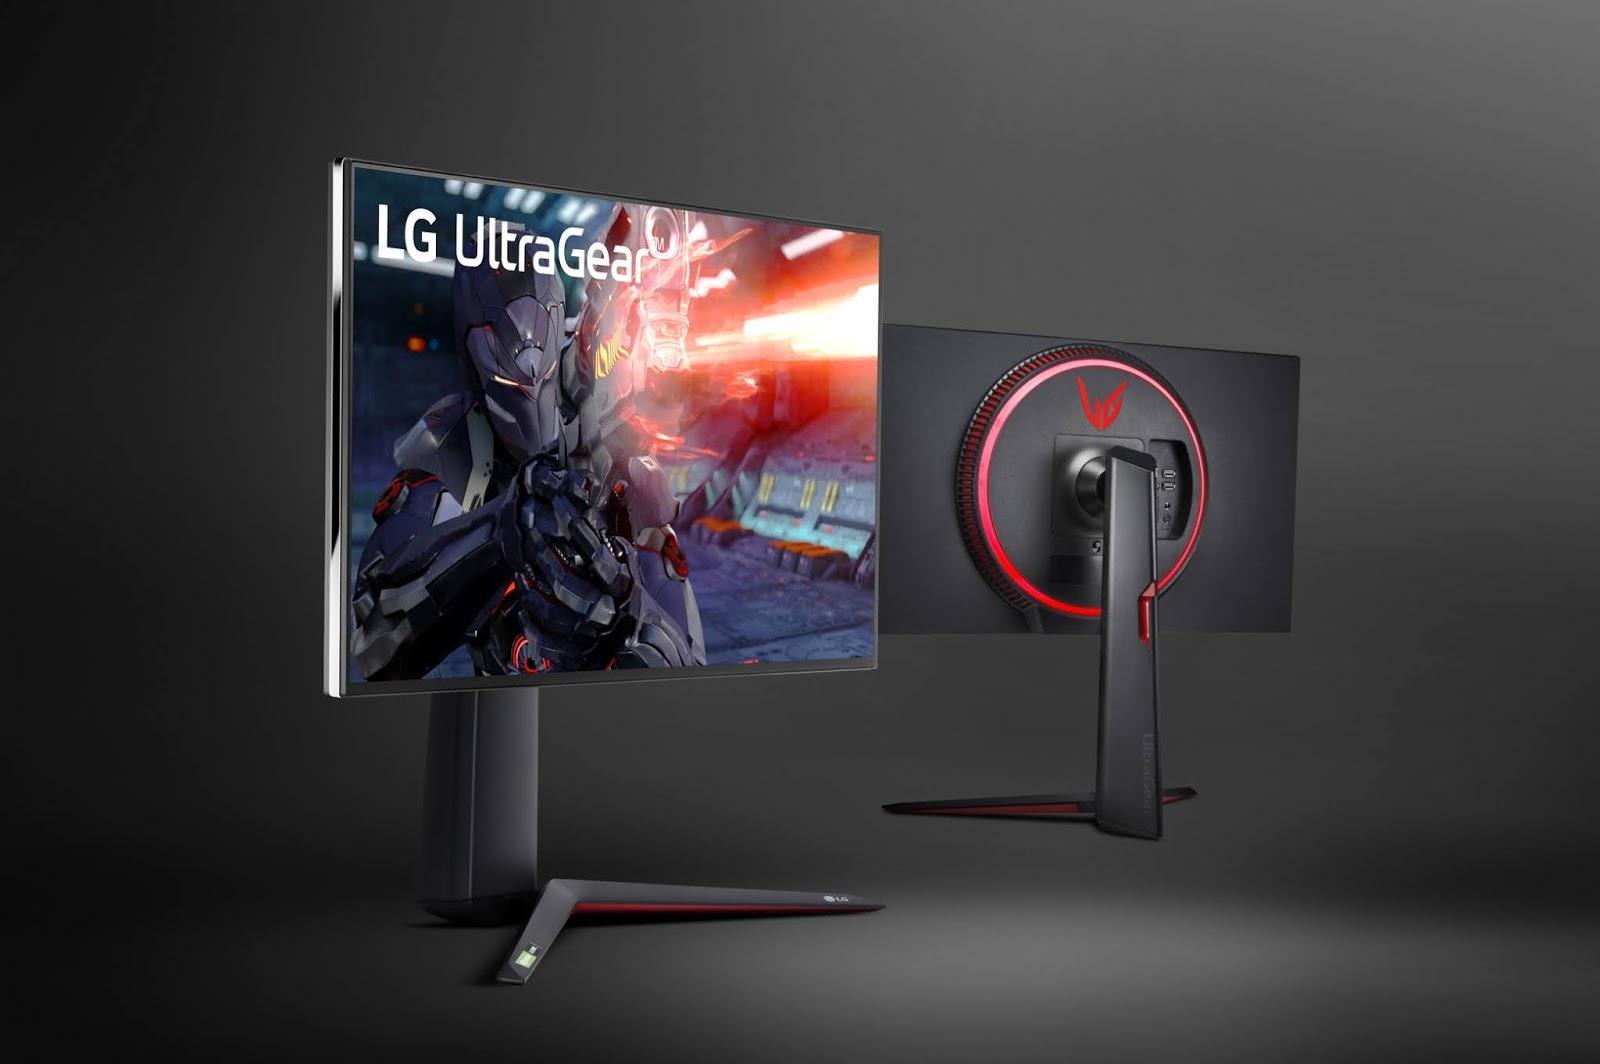 LG presenta su nuevo monitor UltraGear modelo 27GN950